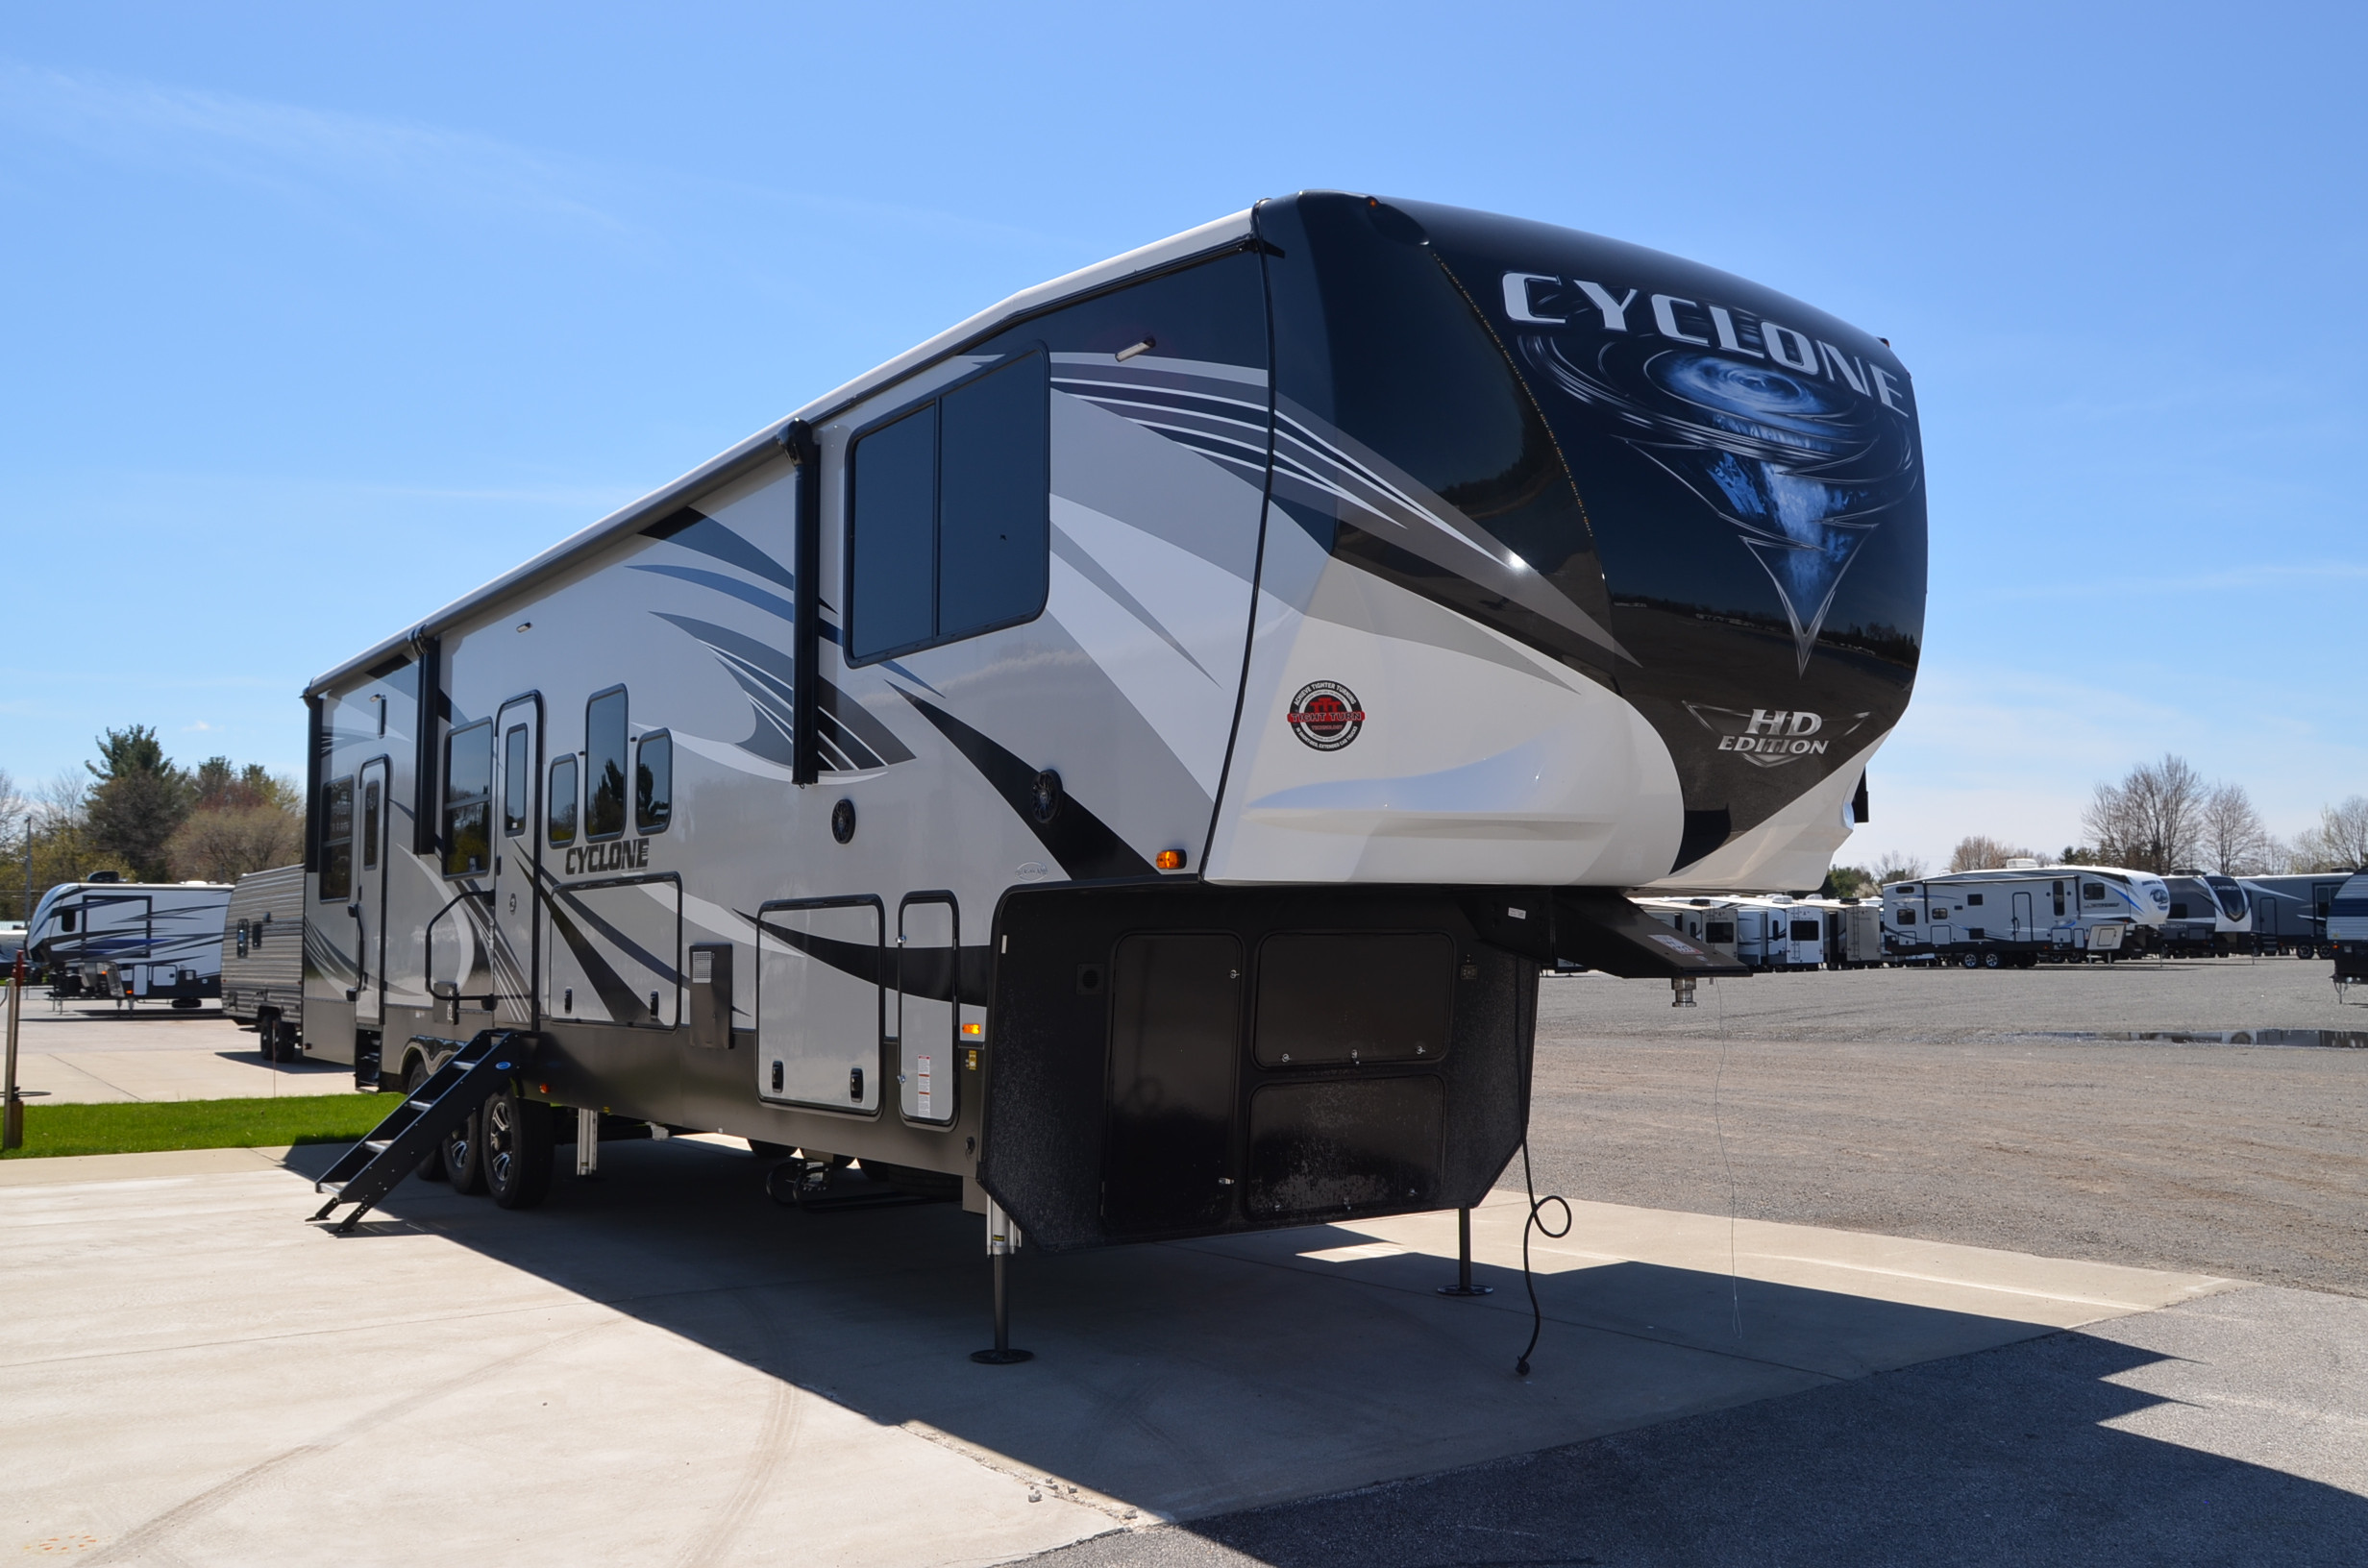 2021 Heartland Cyclone 4007 Camper Ebay